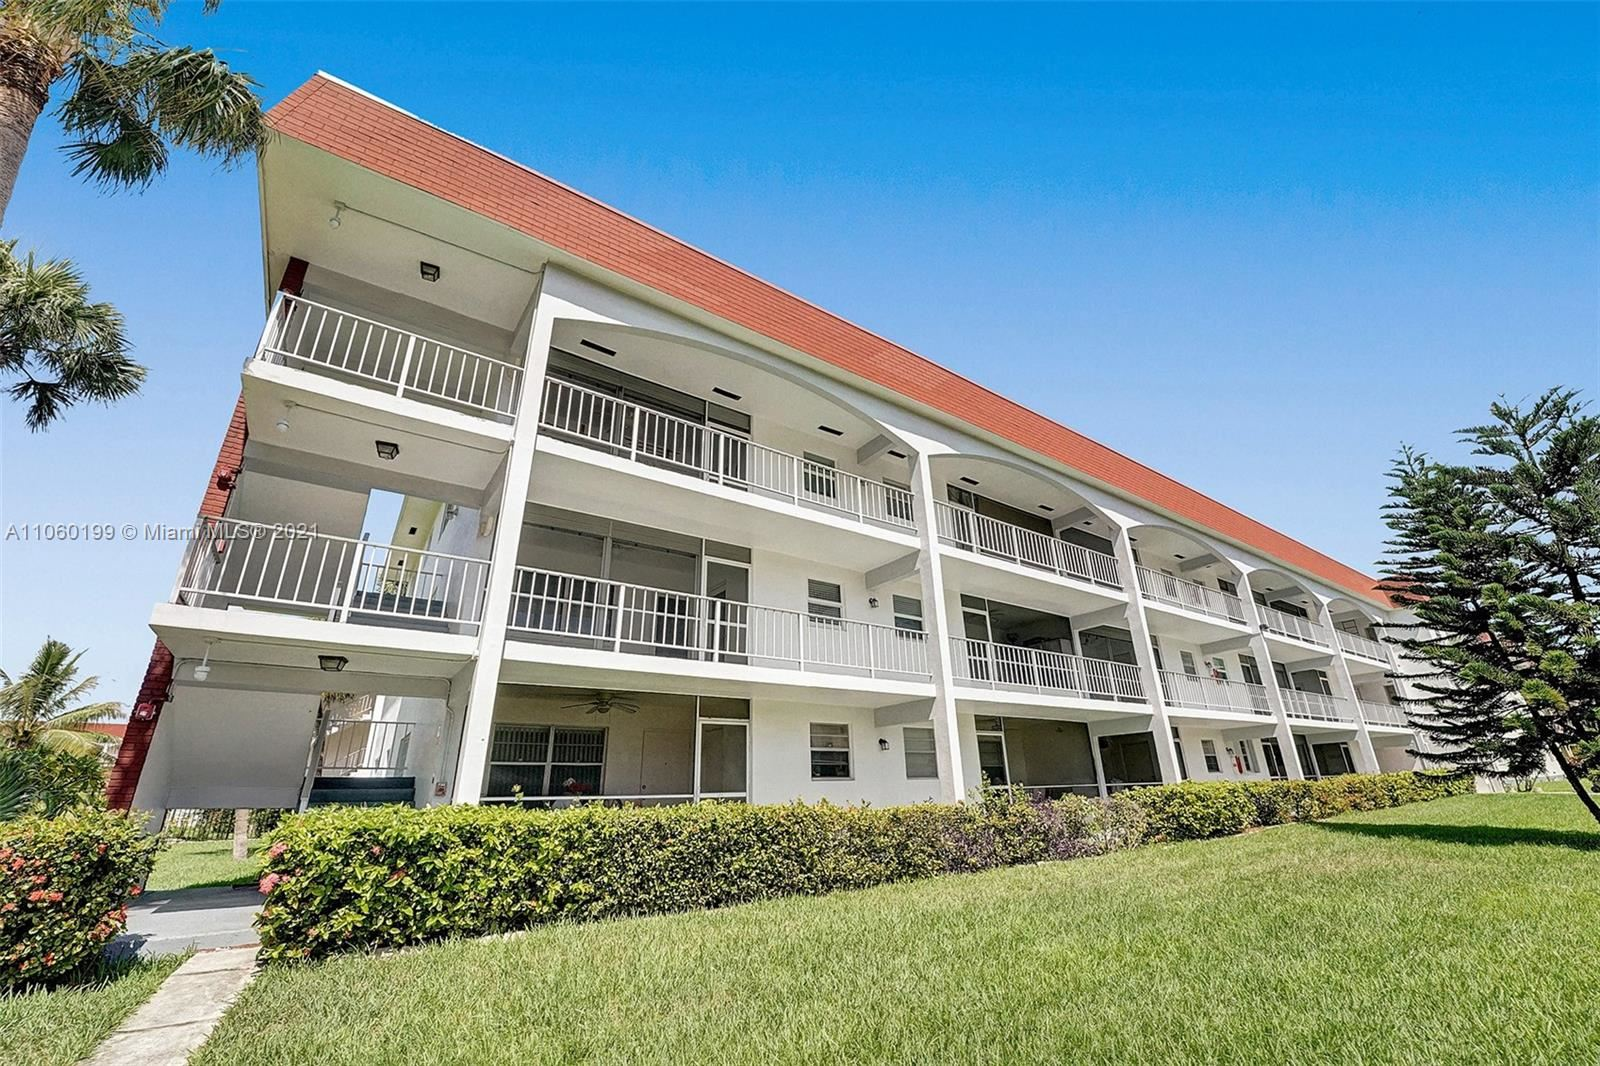 Photo of 541 Blue Heron Dr #109, Hallandale Beach, FL 33009 (MLS # A11060199)